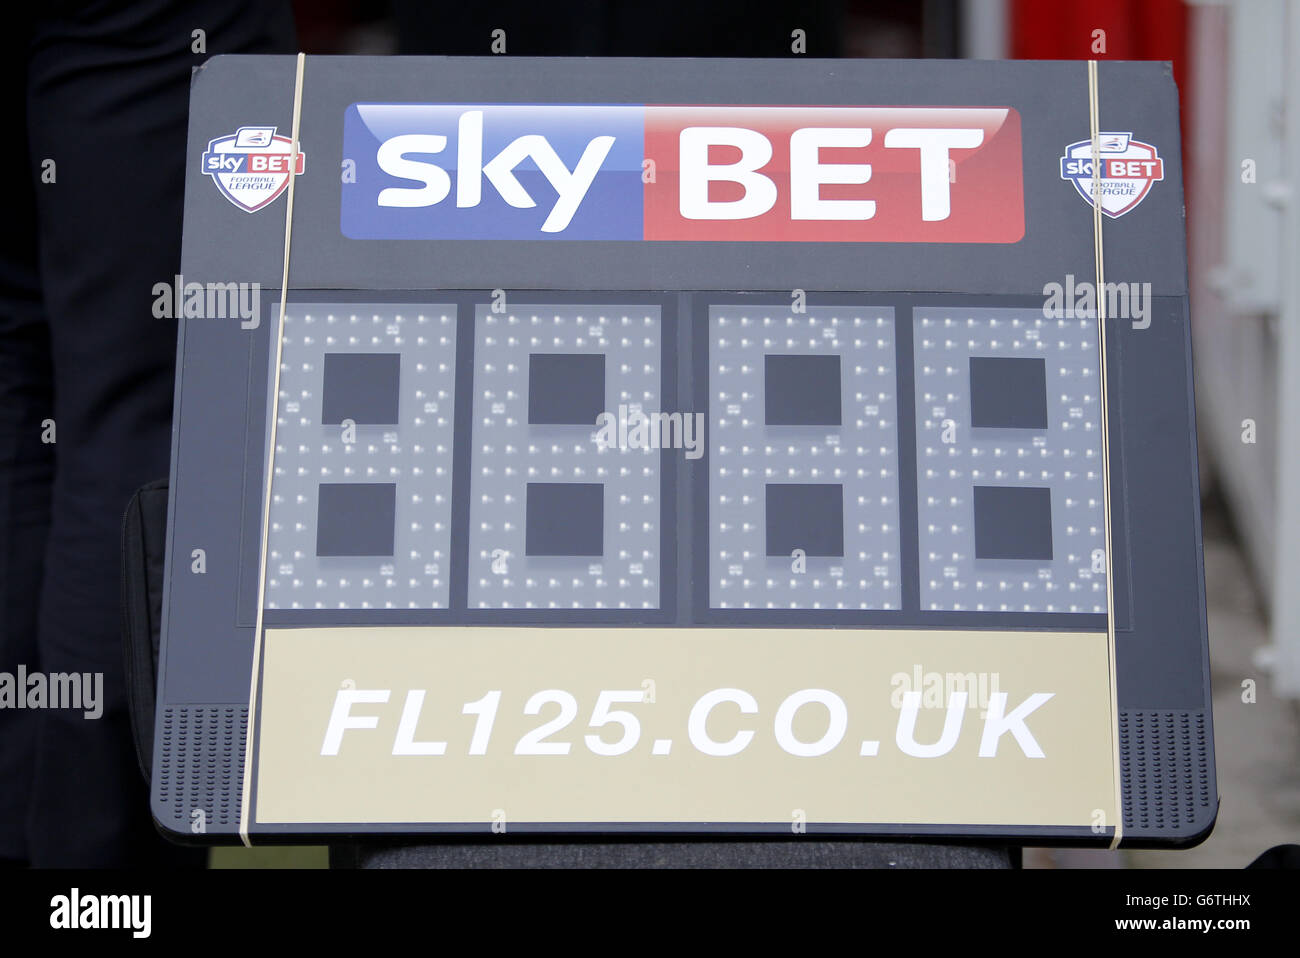 Soccer - Sky Bet Championship - Middlesbrough v Blackburn Rovers - Riverside - Stock Image